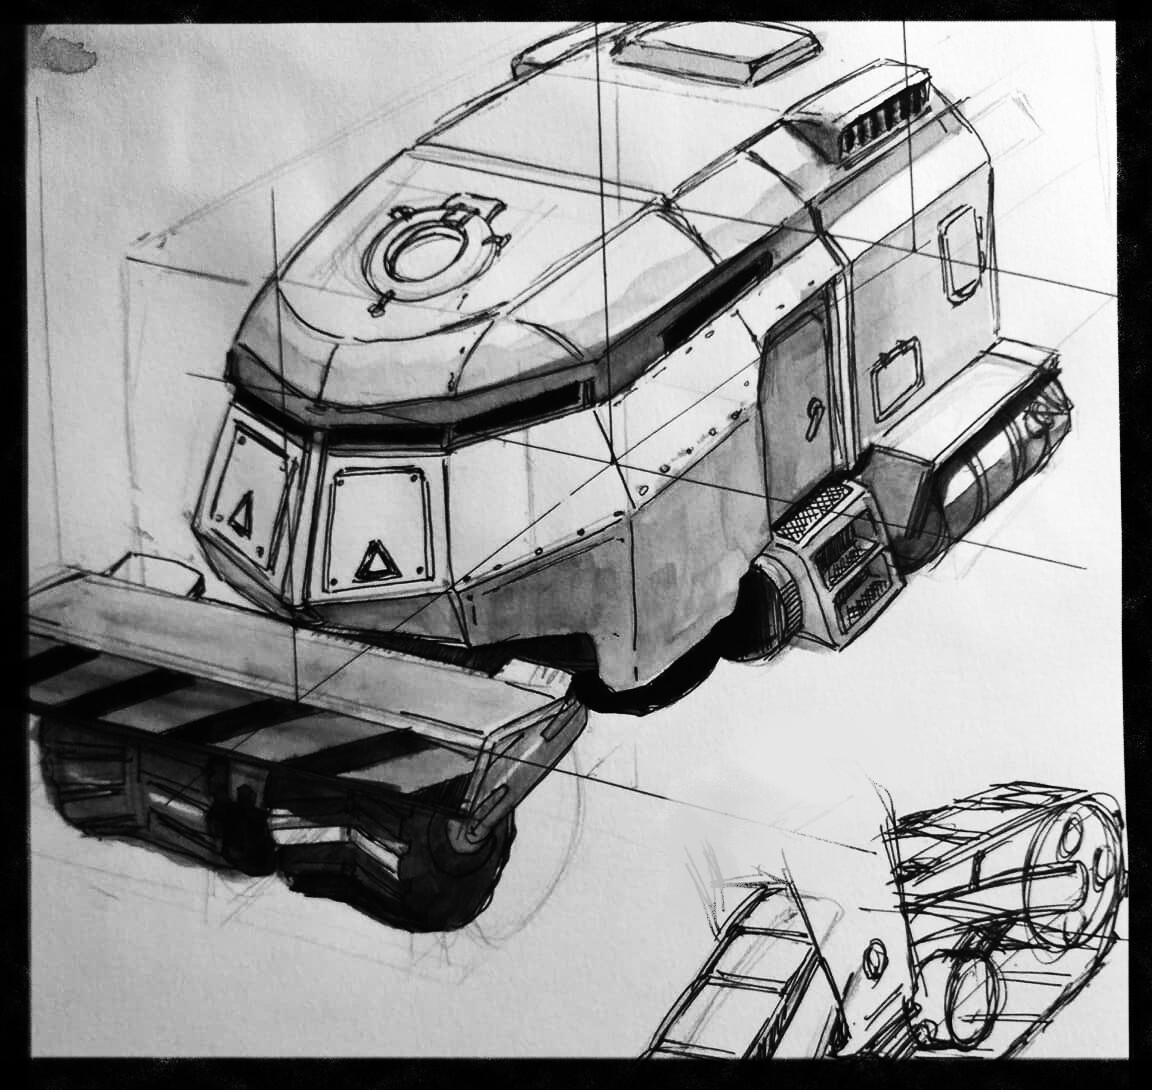 quick detail sketch